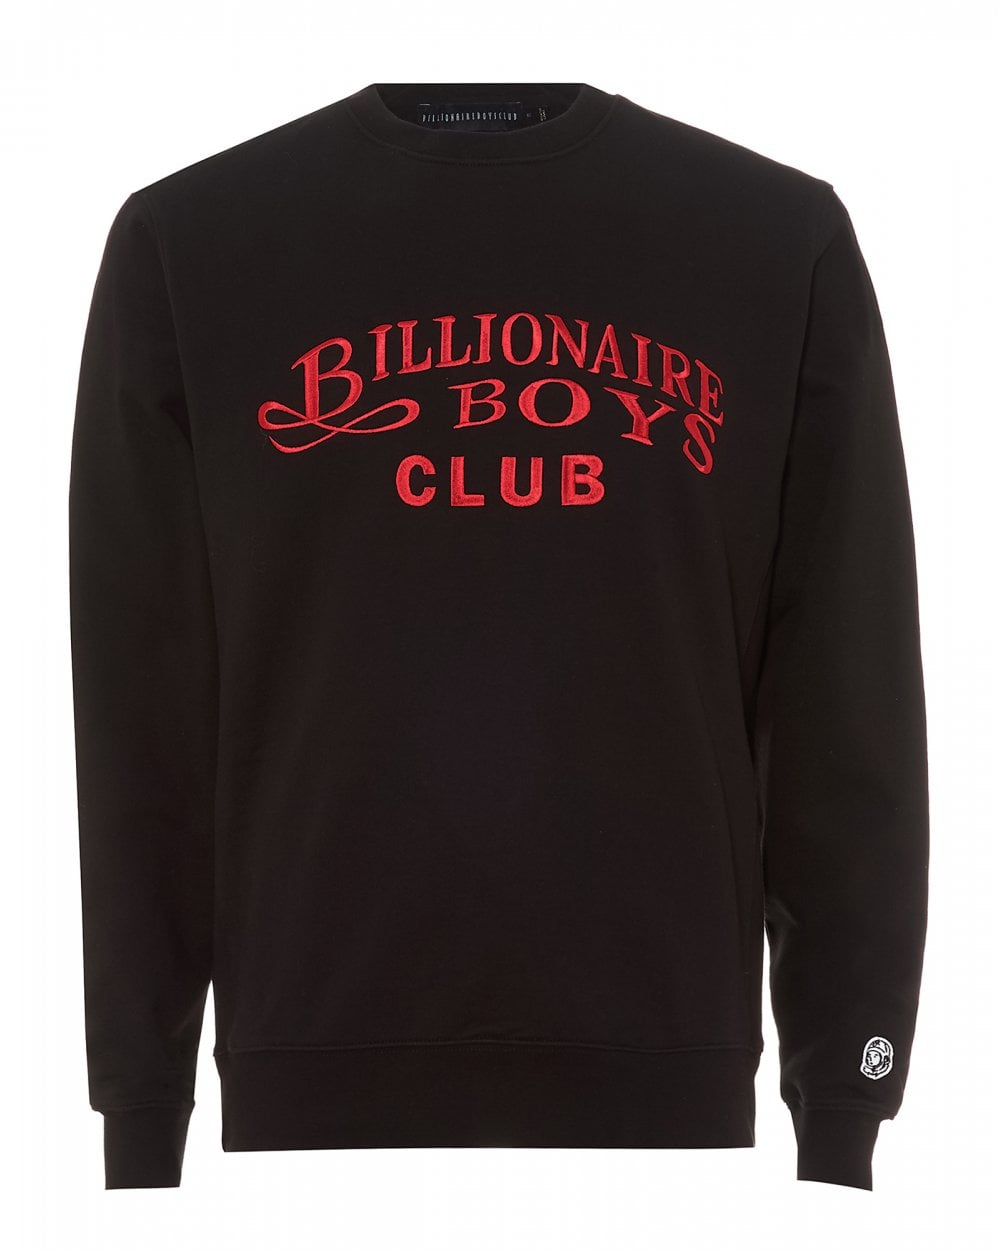 a9d45e207 Billionaire Boys Club Mens Embroidered Script Sweatshirt, Black Sweat